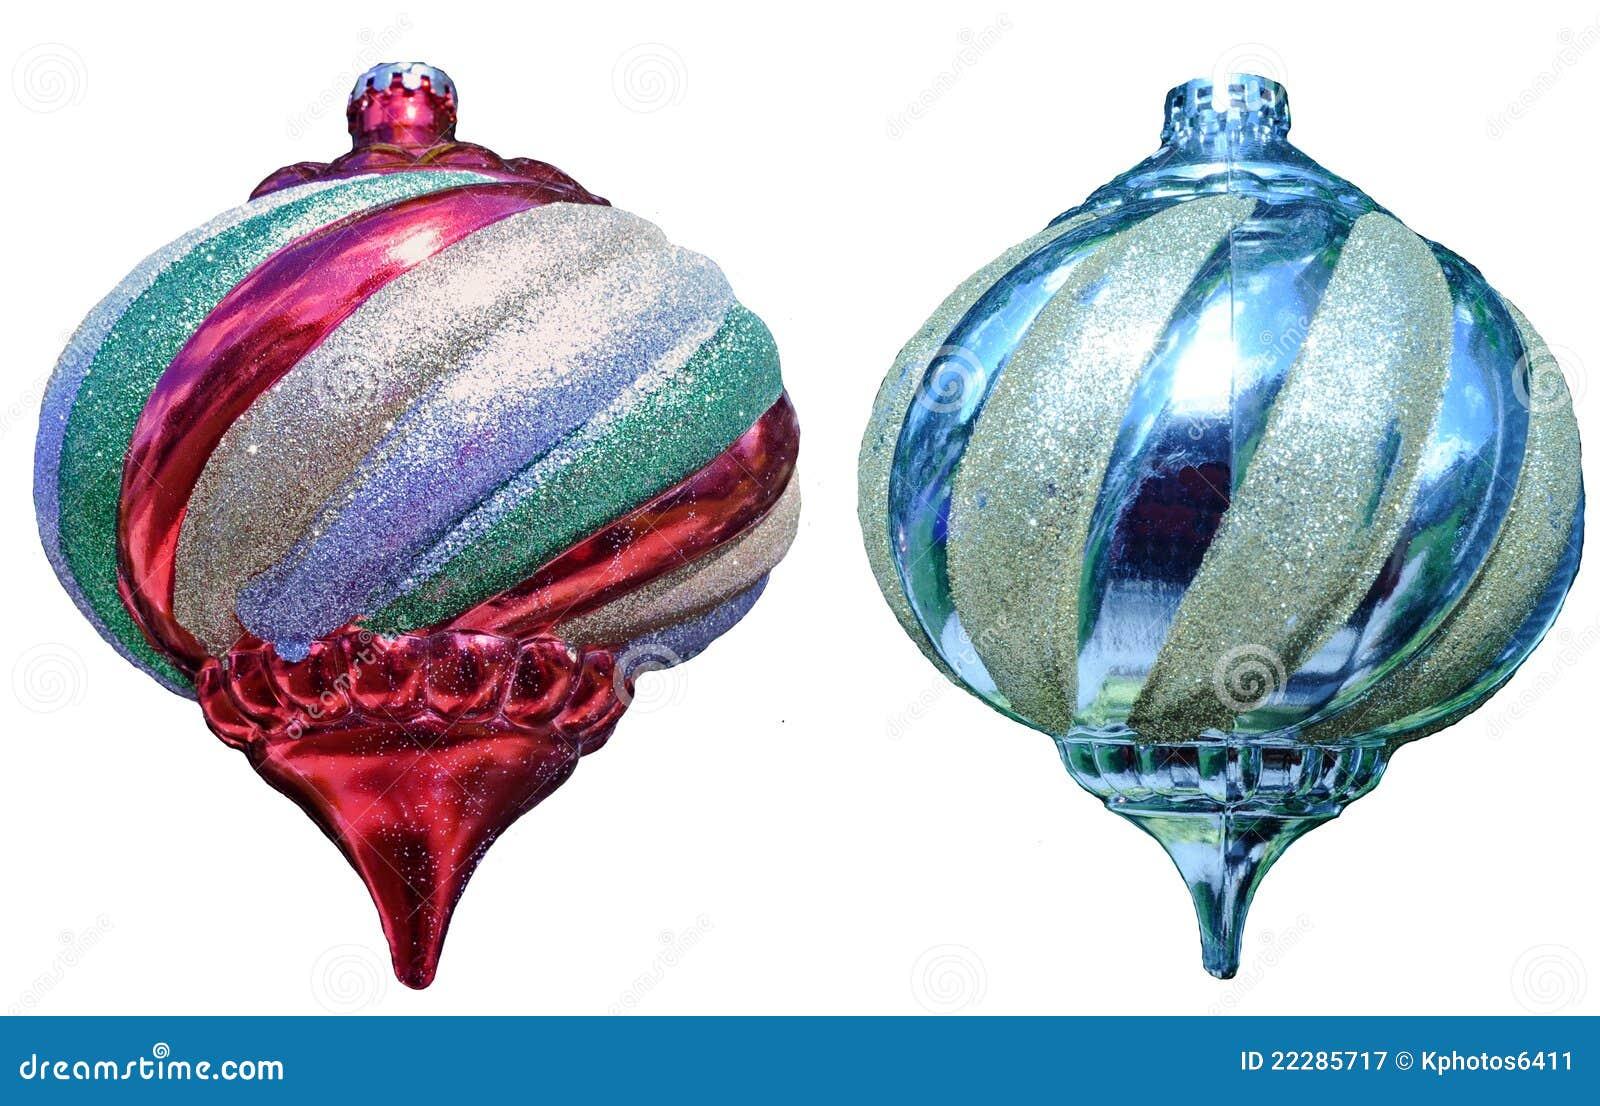 Christmas tree balls stock image image of isolated blue for Christmas tree balls